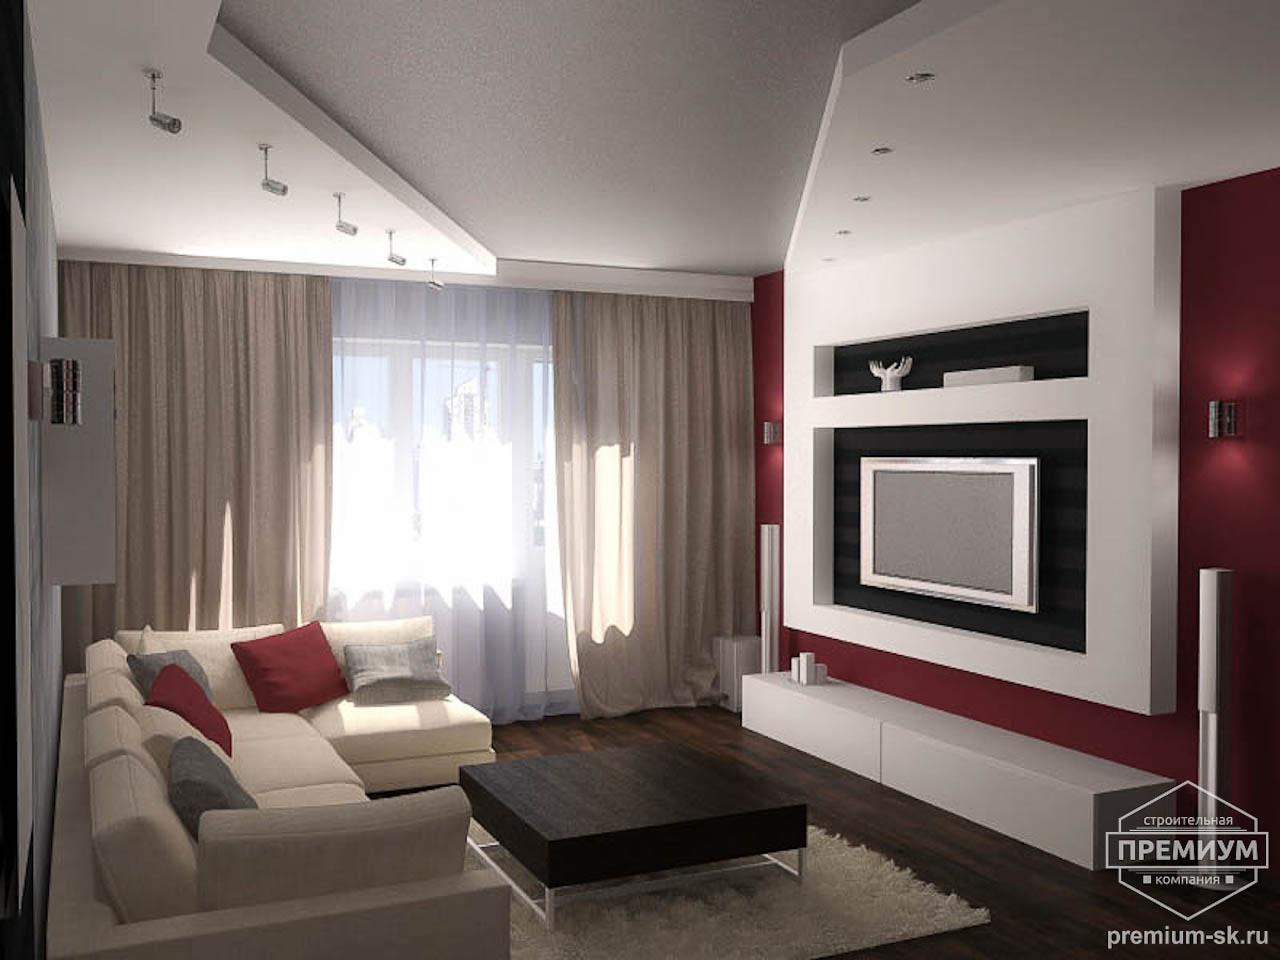 Дизайн интерьера однокомнатной квартиры по ул. Сыромолотова 11 img1006278758